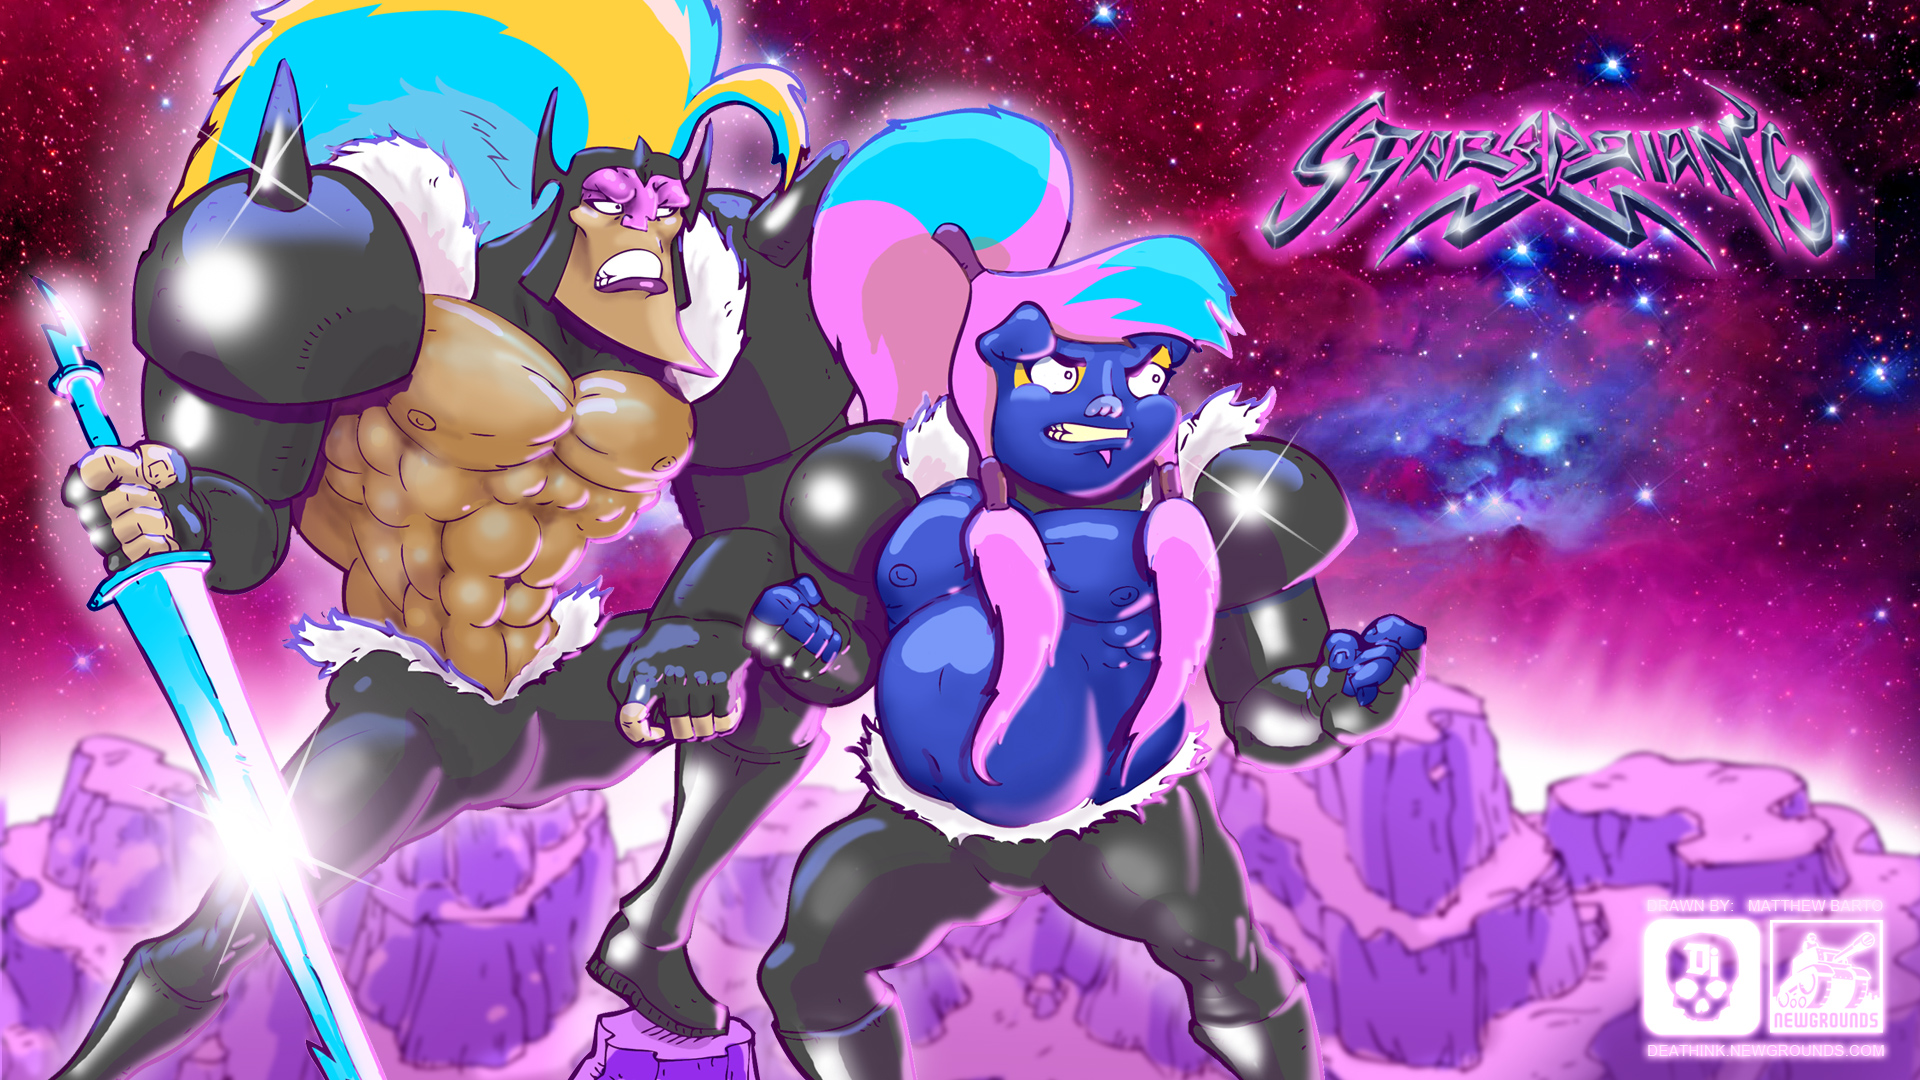 Starbarians